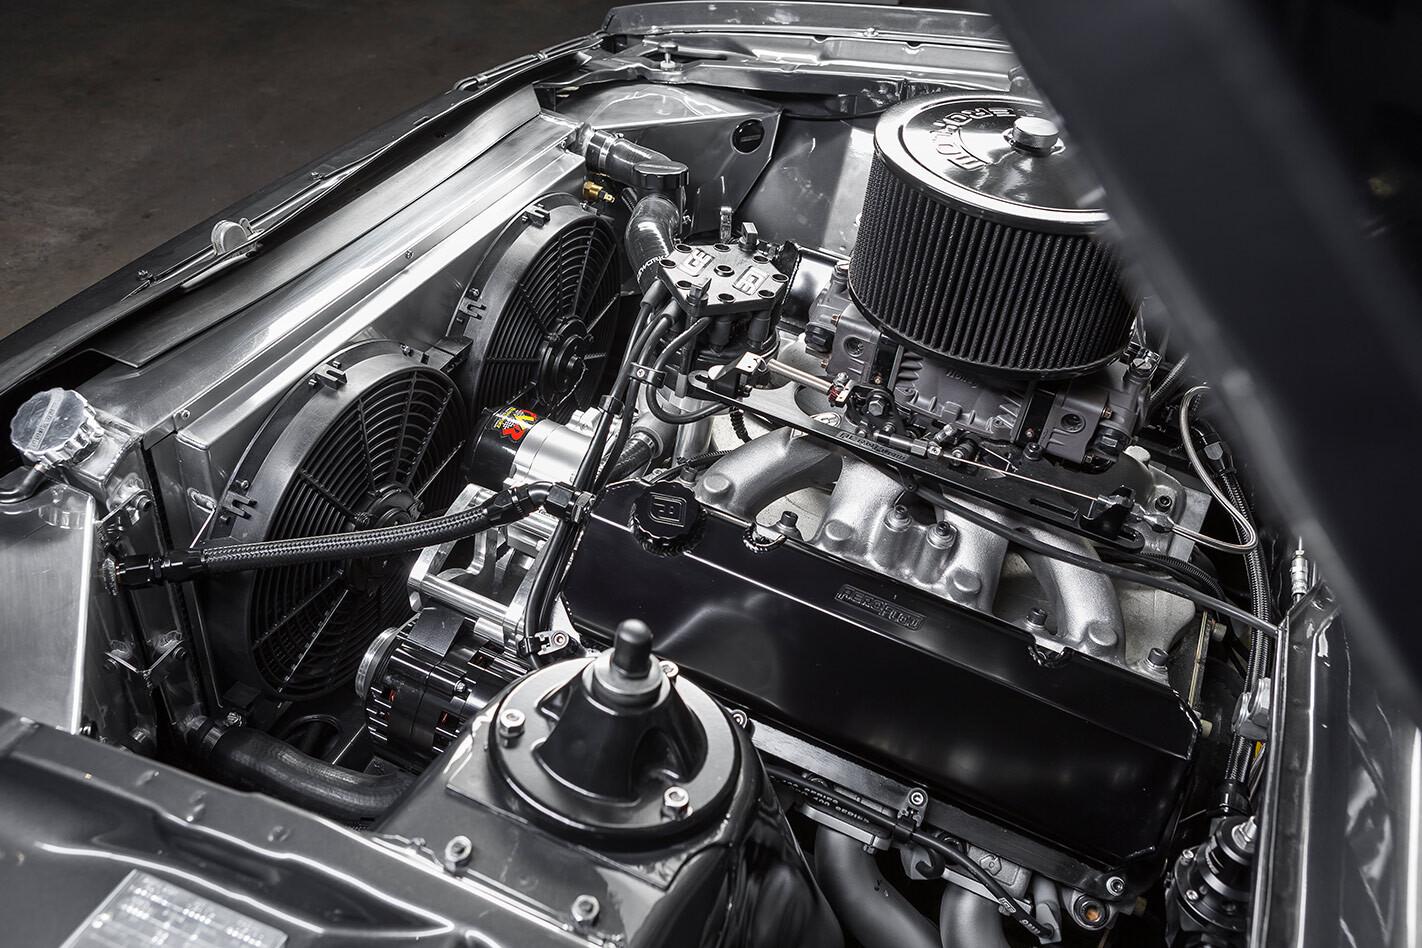 Ford XD Falcon engine